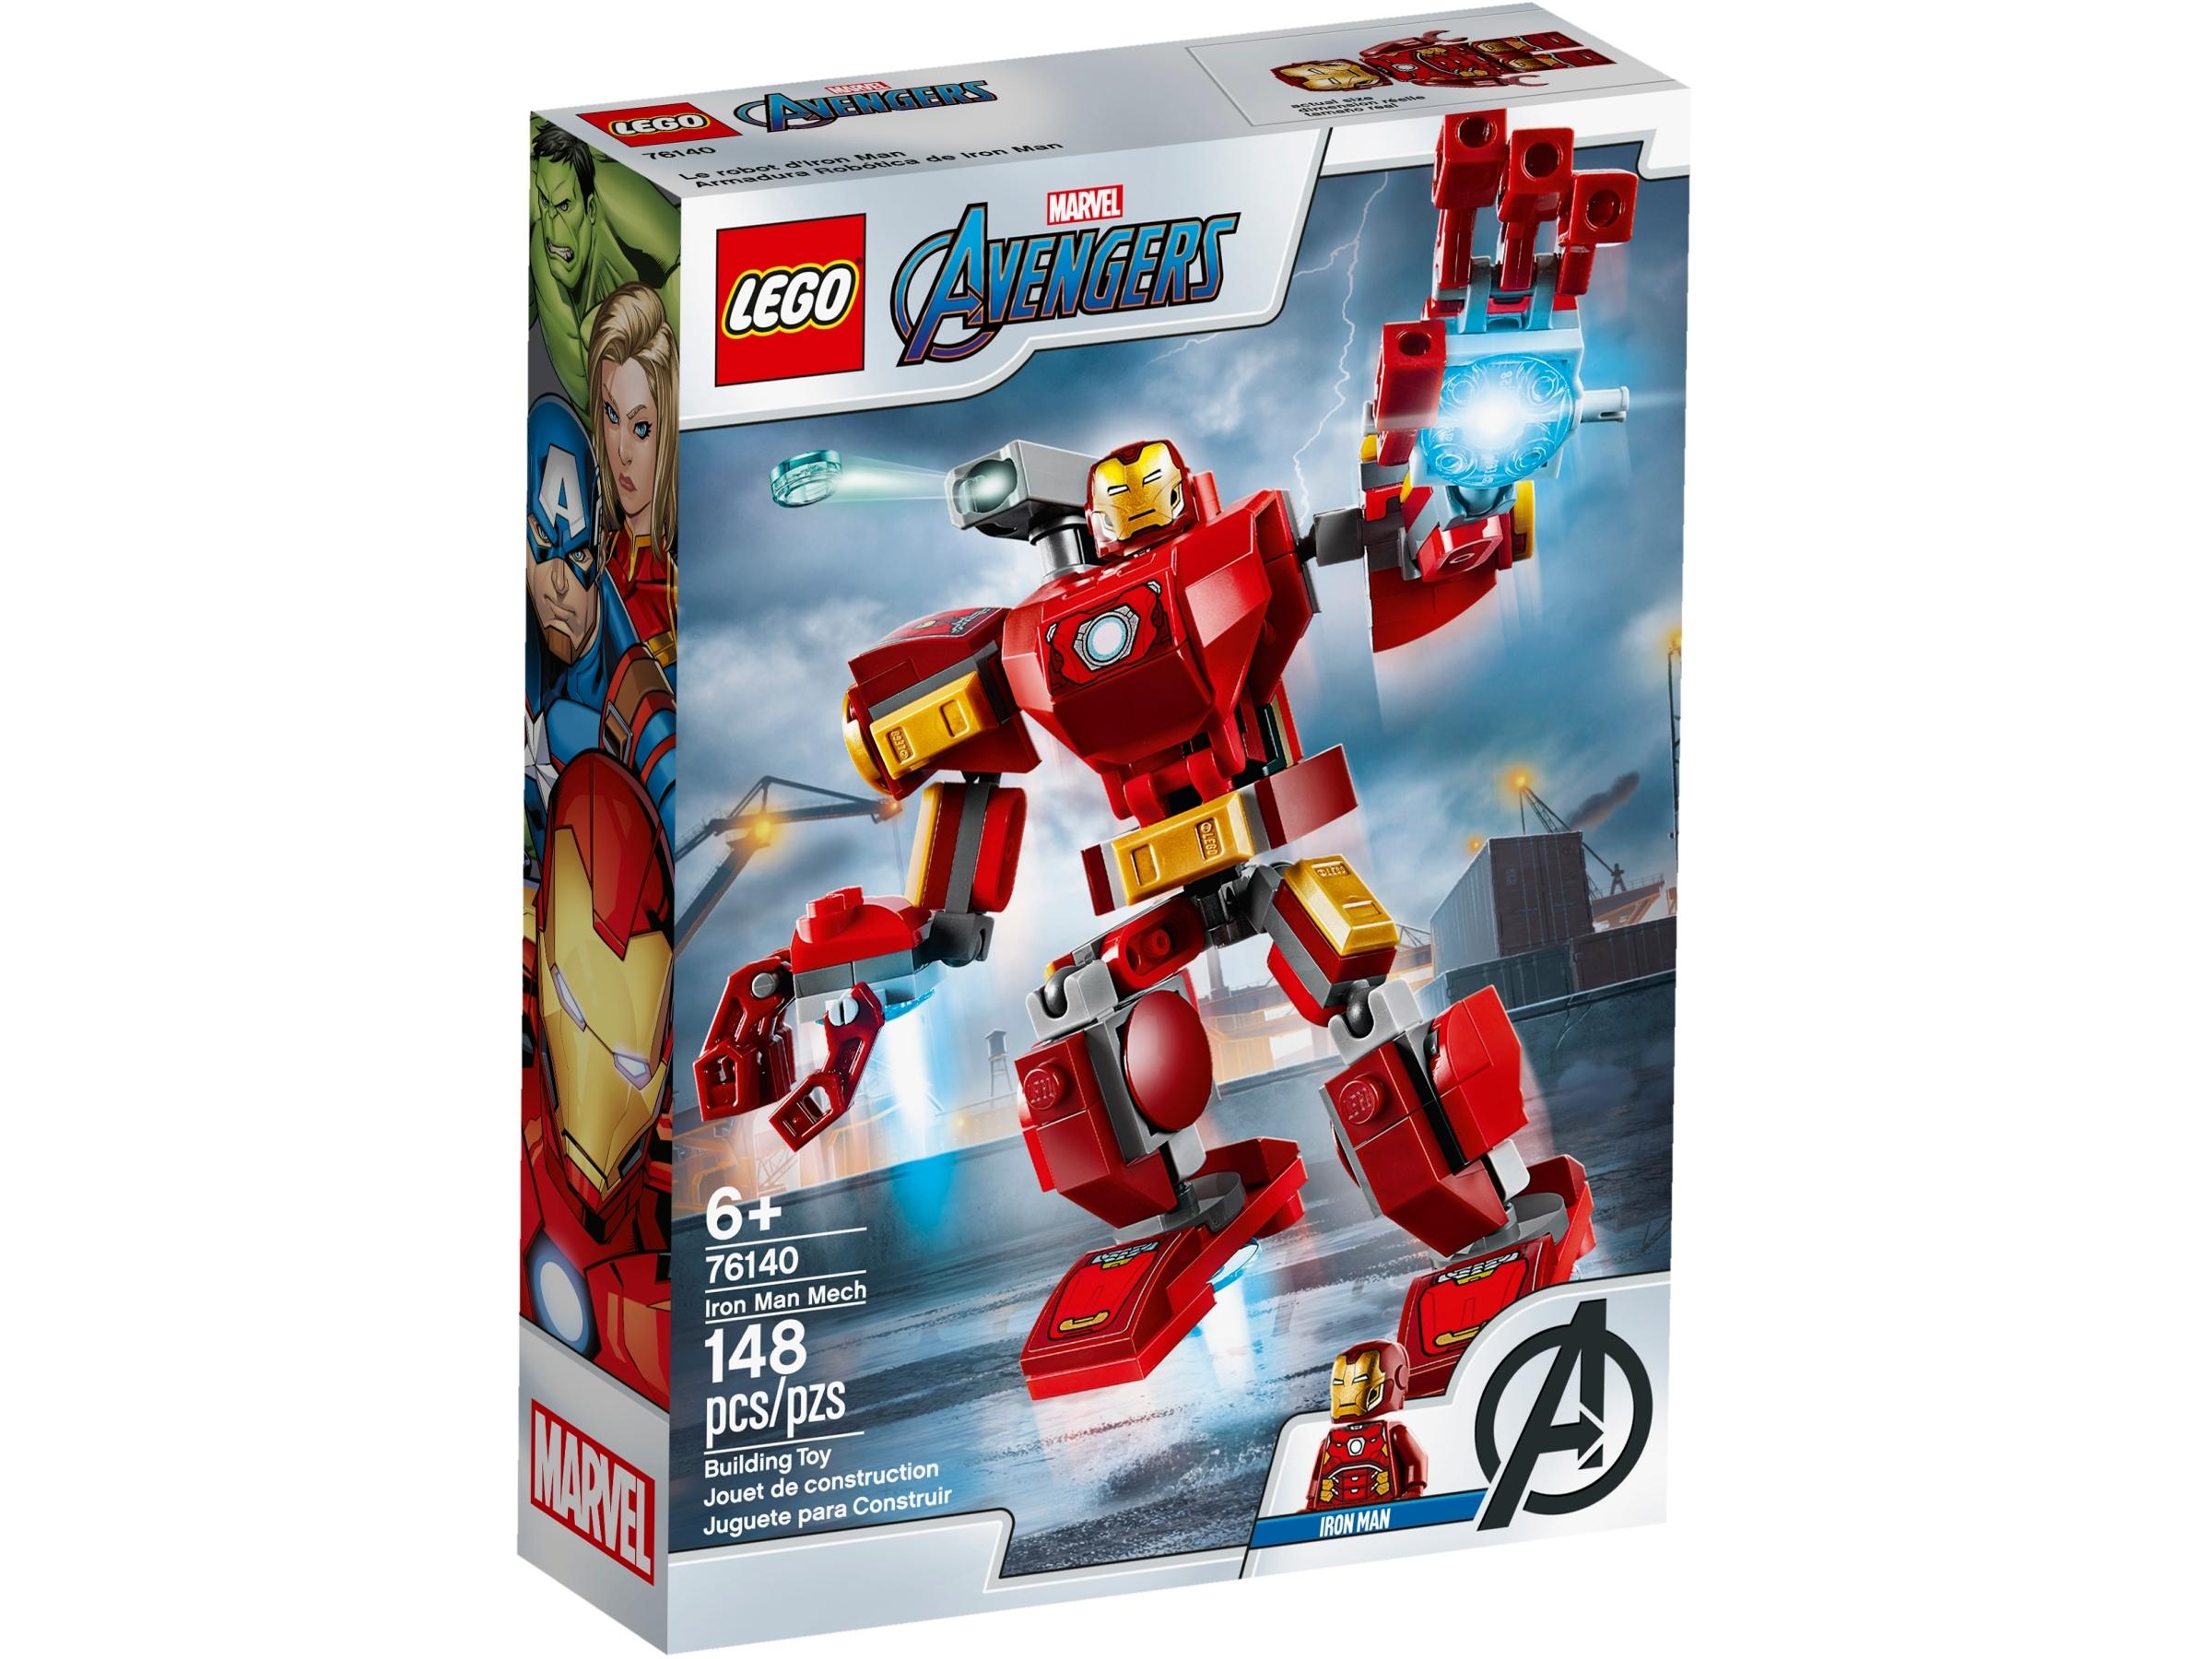 Custom Lego* Set Iron Man Armored Adventures with Thanos BAF